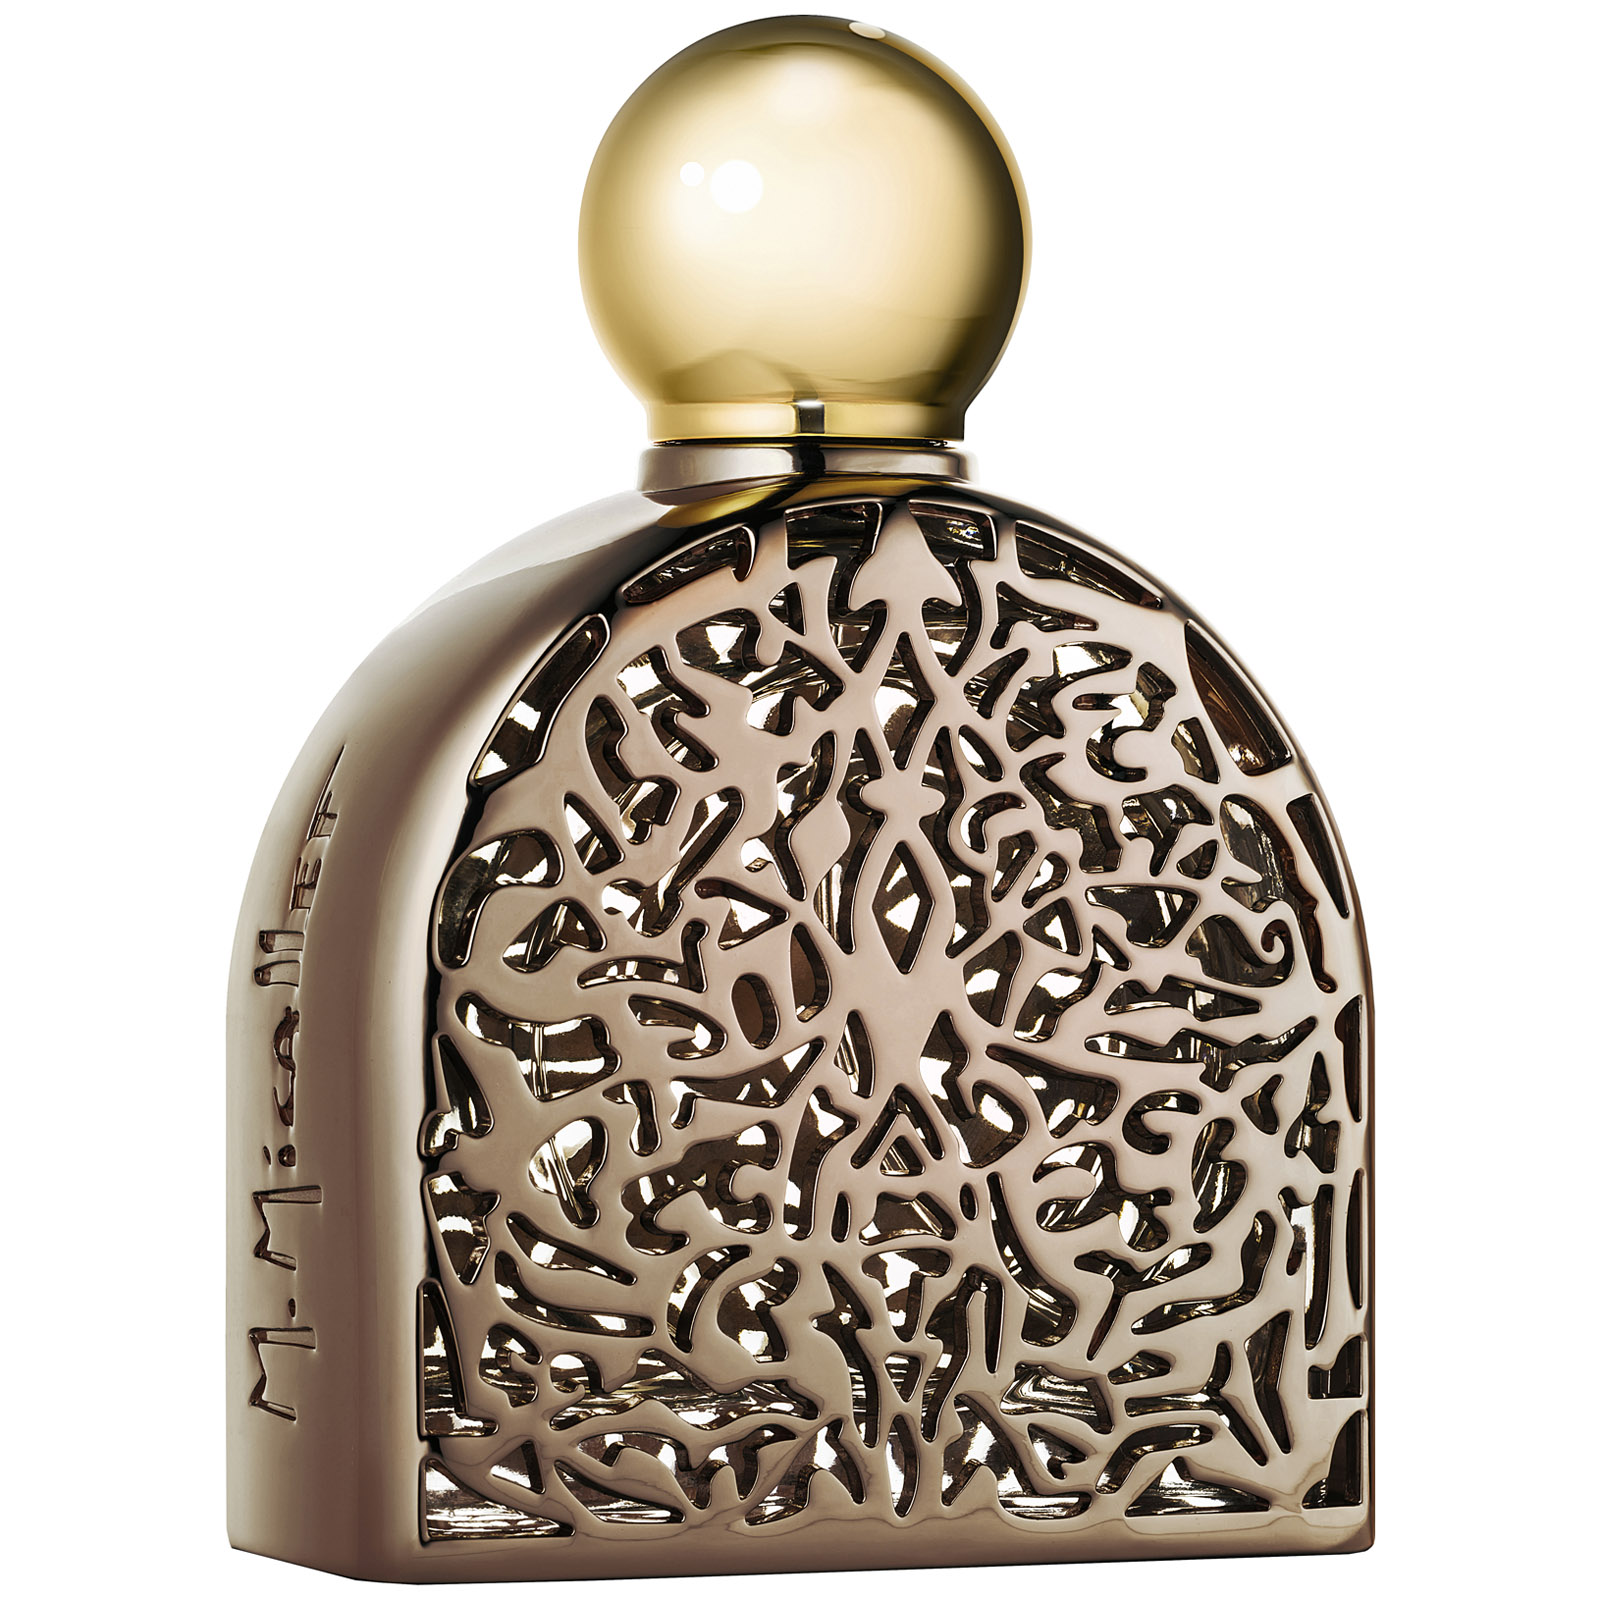 Secrets of love gourmet profumo eau de parfum 75 ml